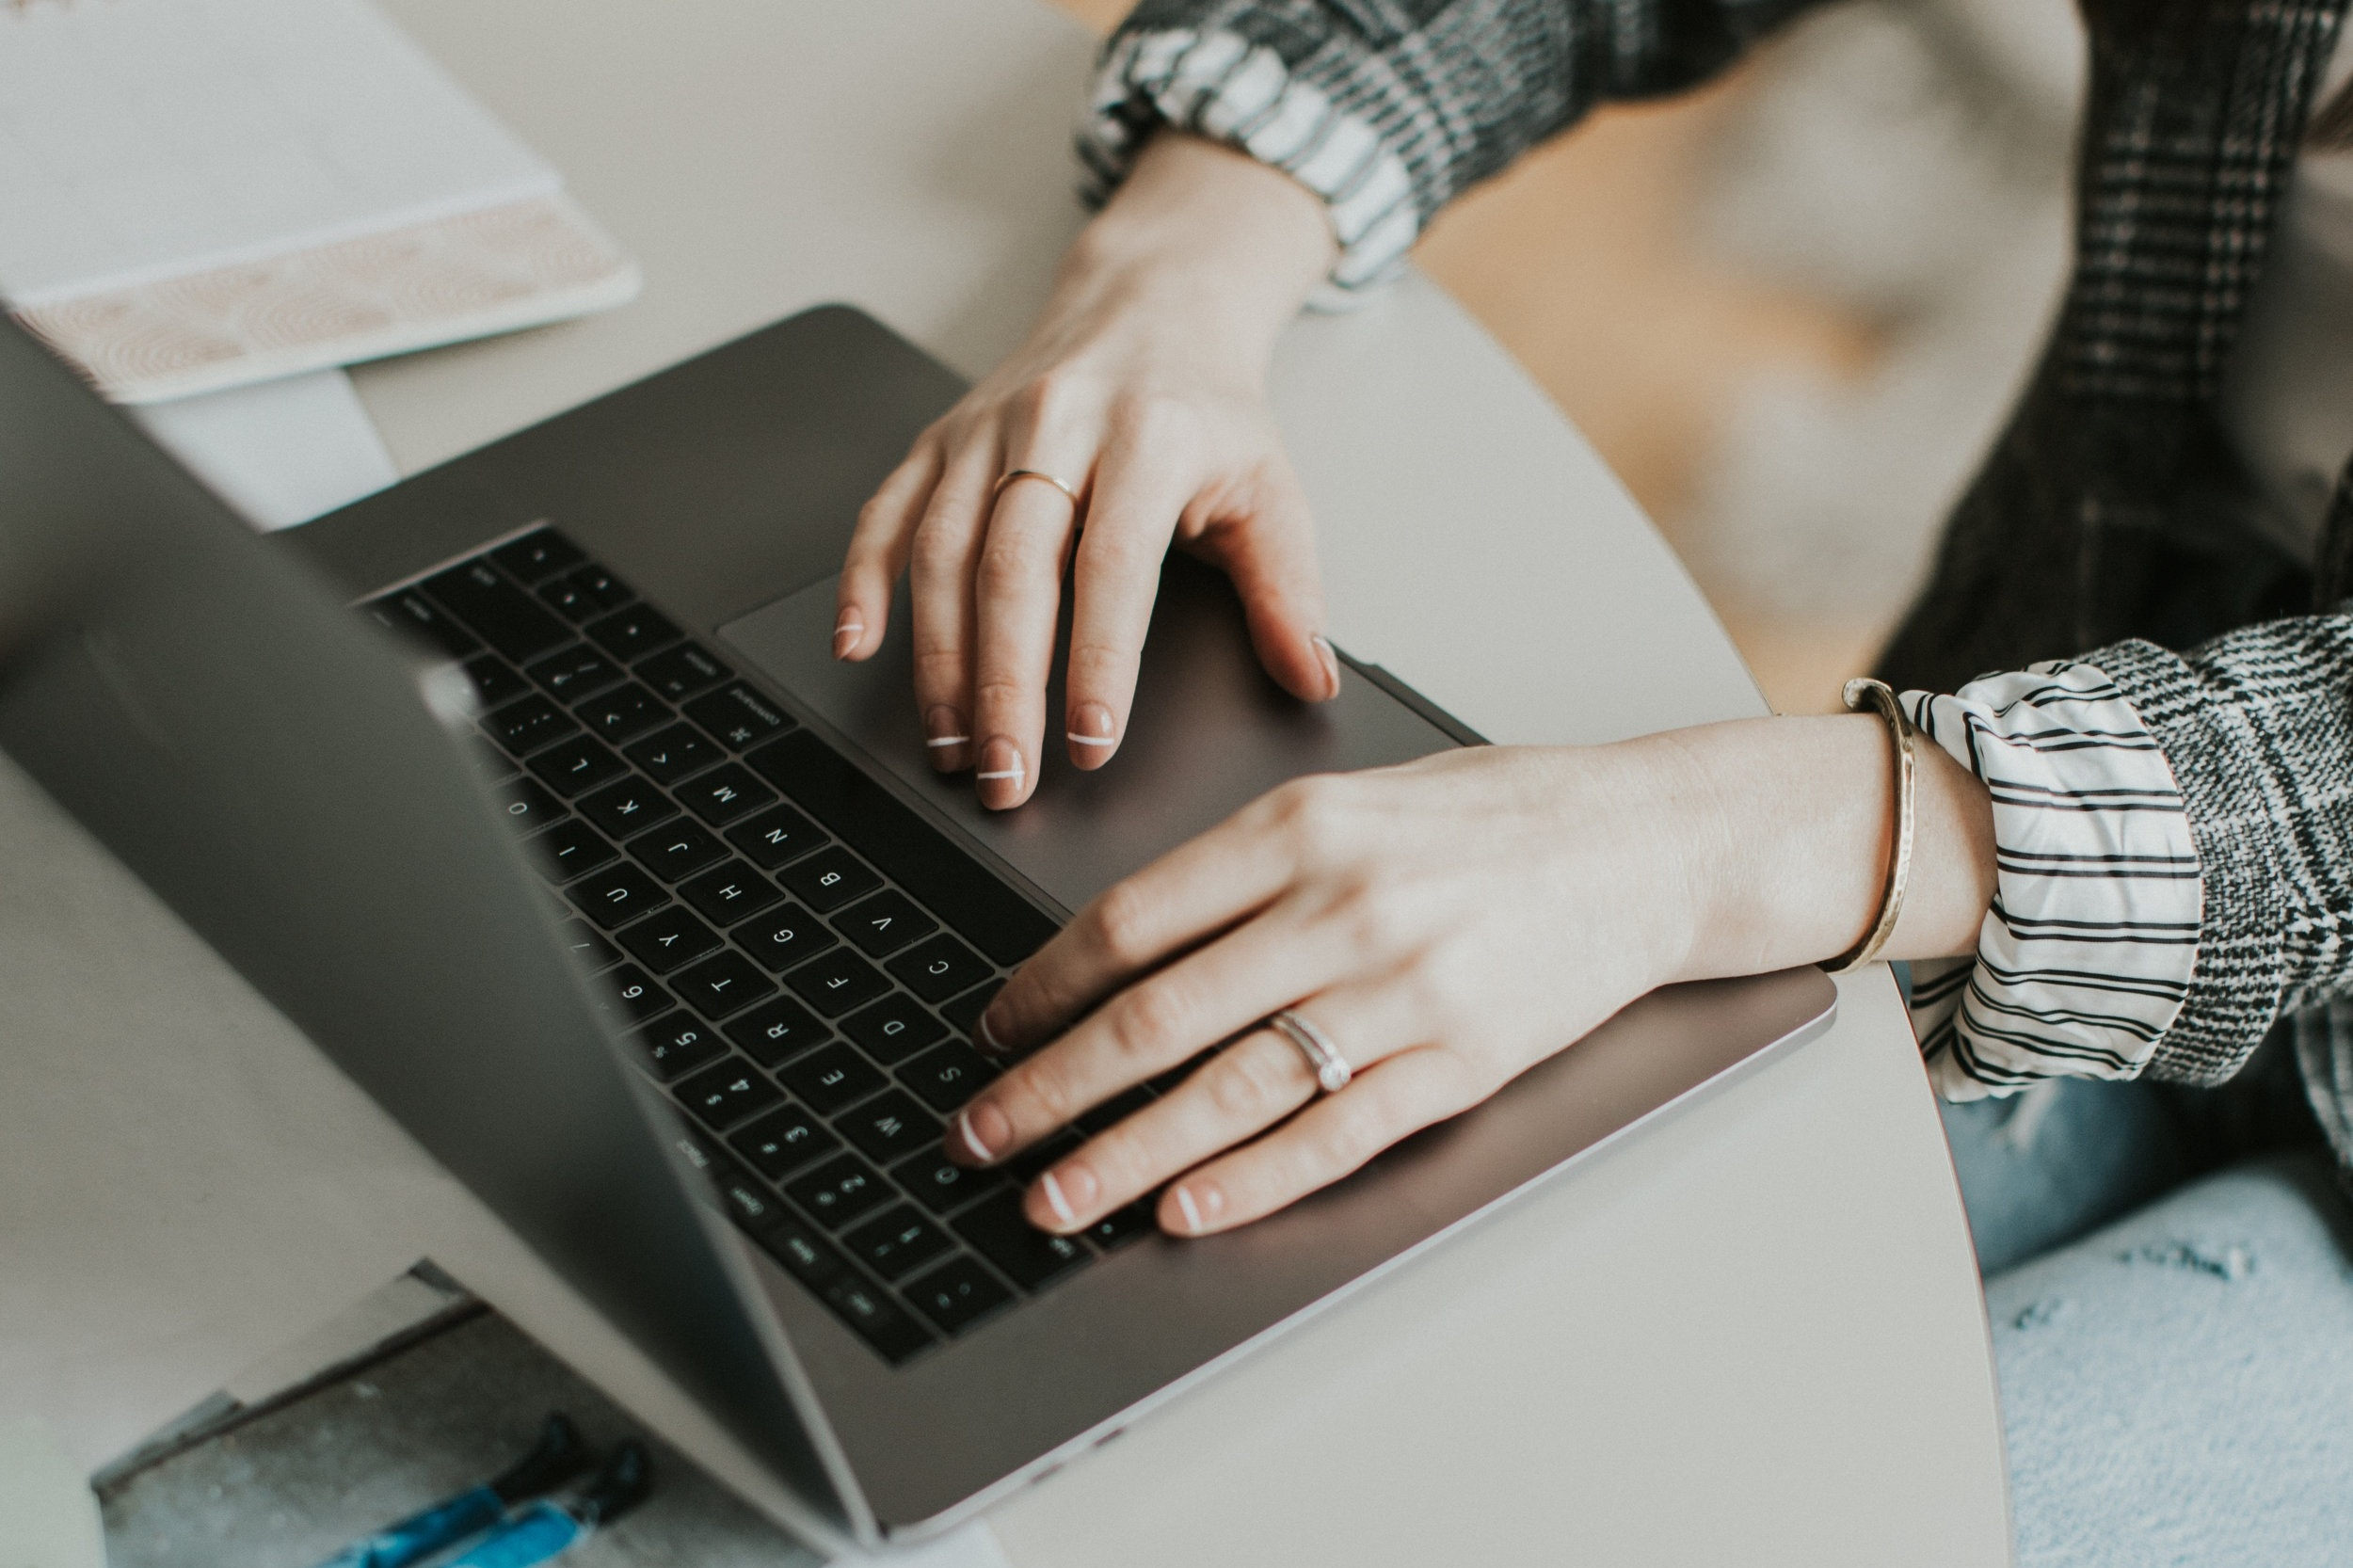 craft-and-curate-blog-entrepreneur-computer-desk